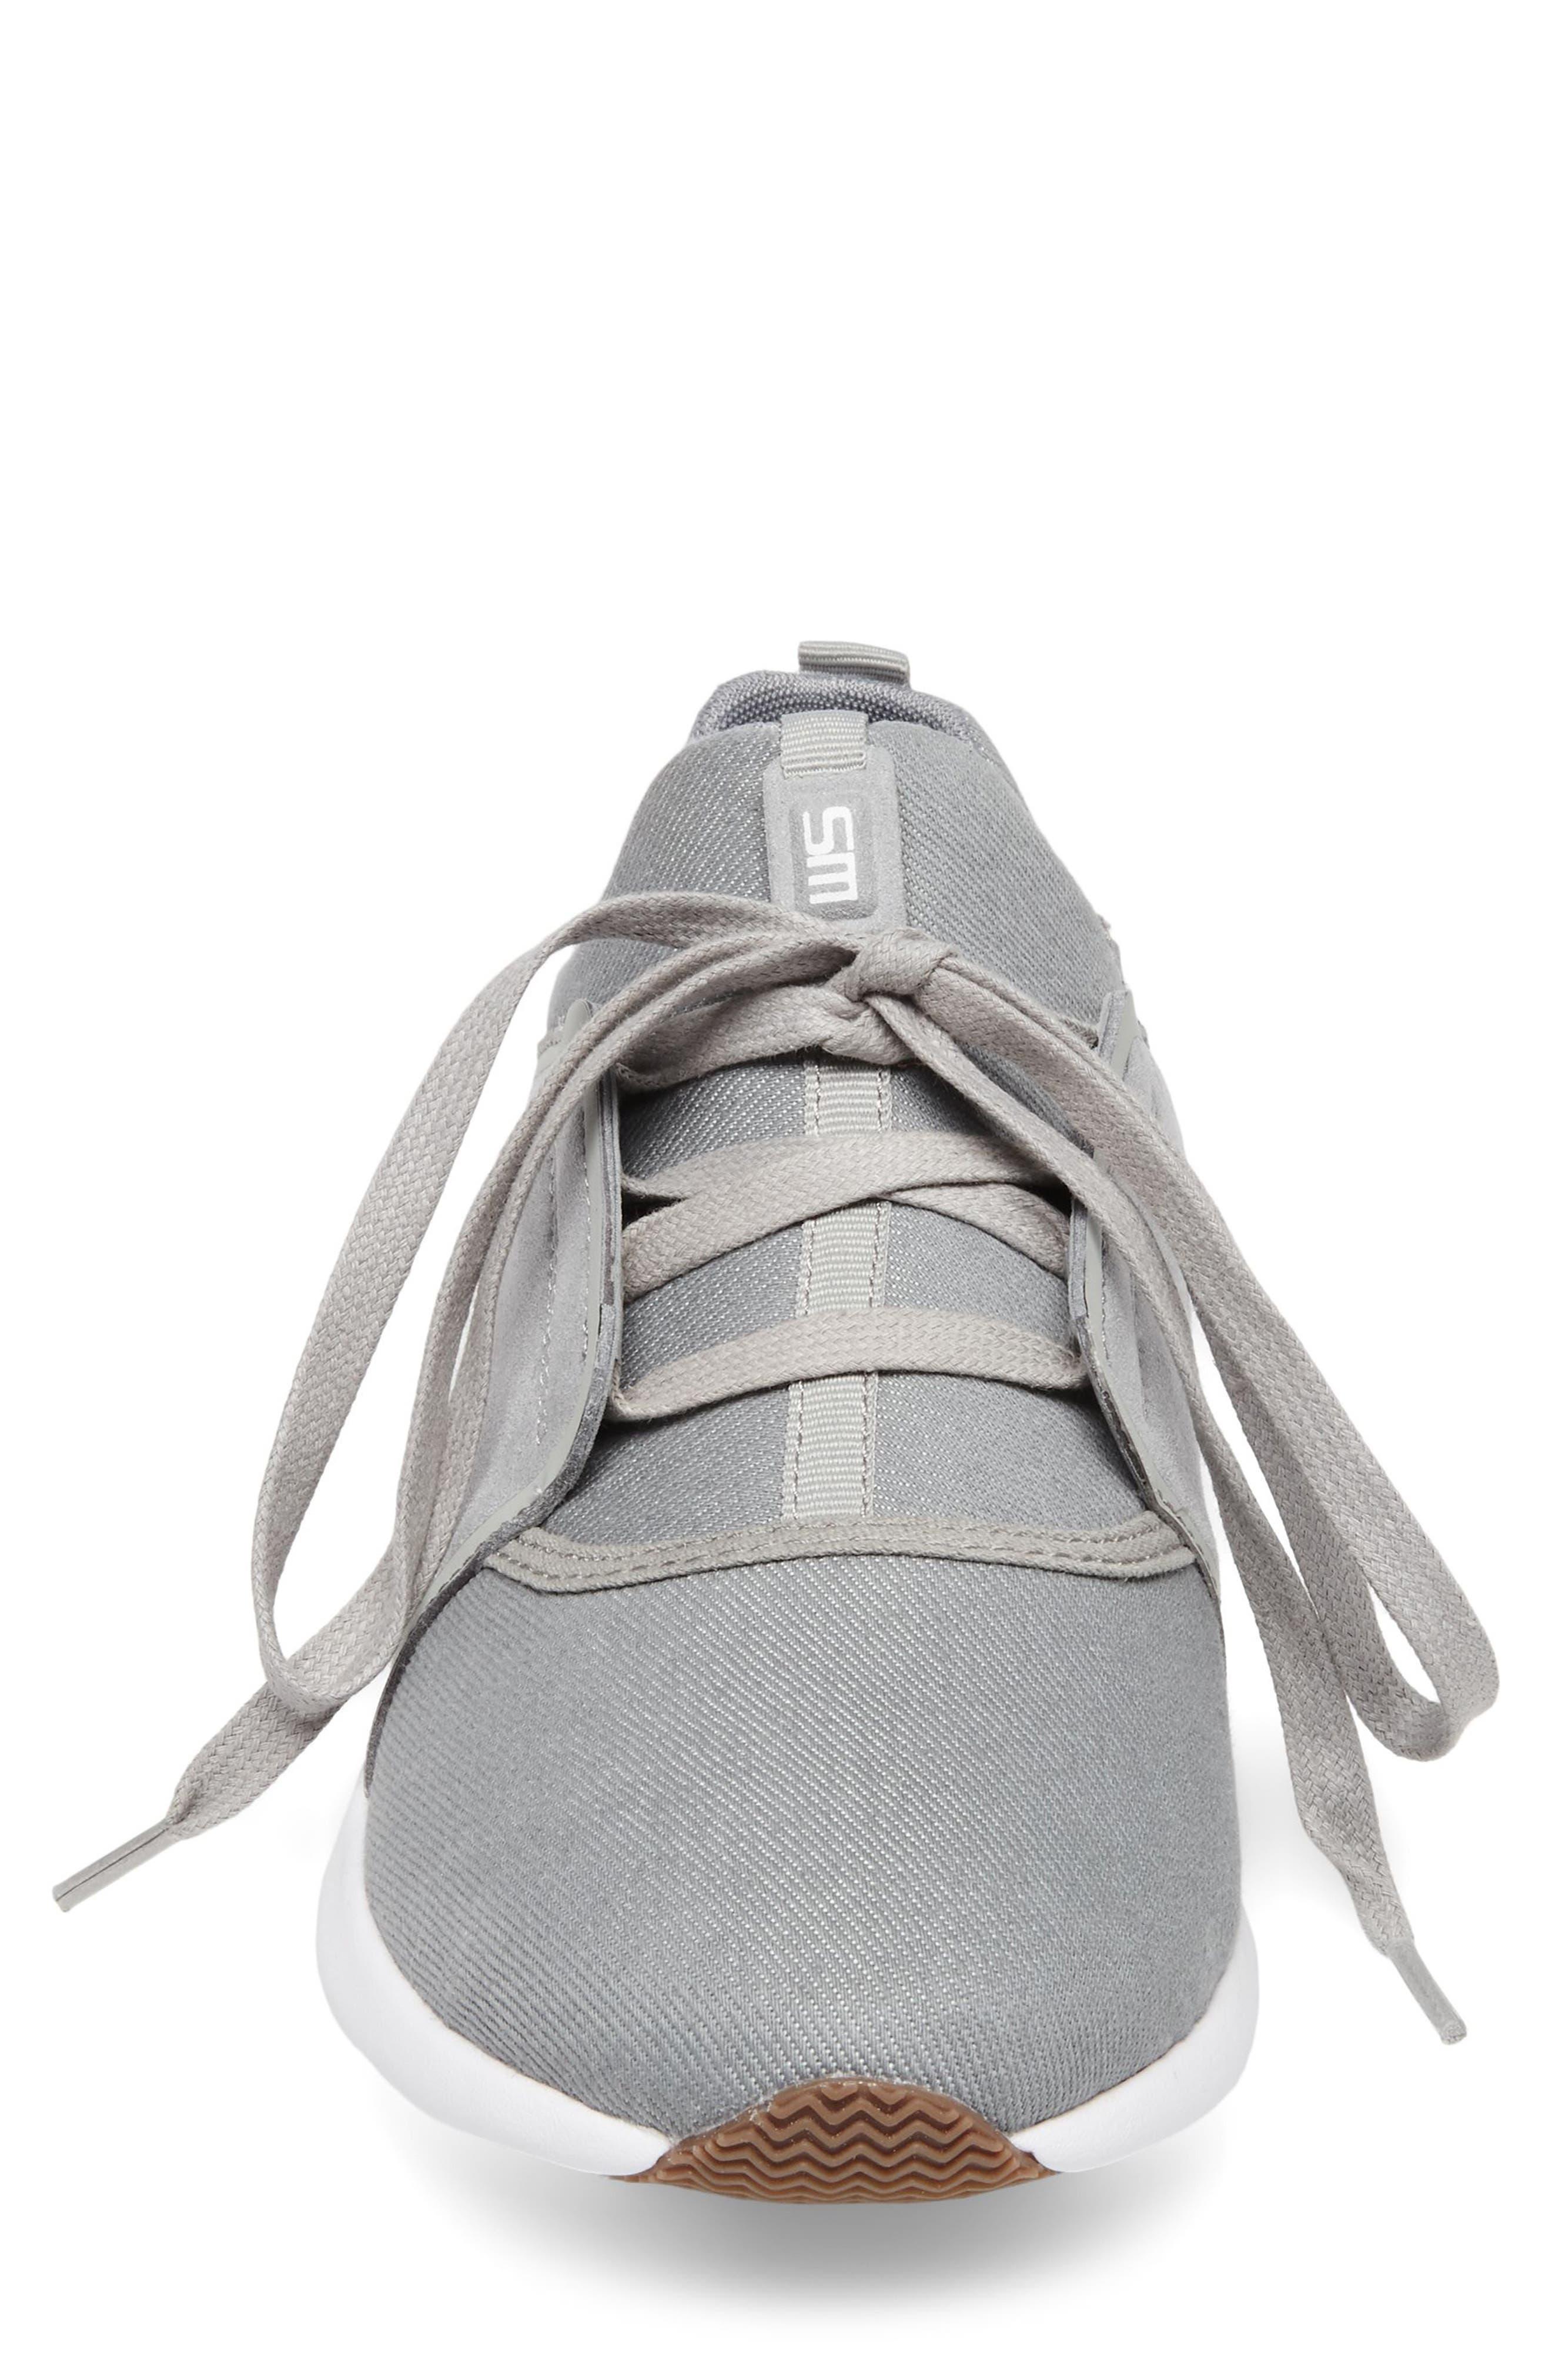 Barrett Sneaker,                             Alternate thumbnail 4, color,                             Grey Leather